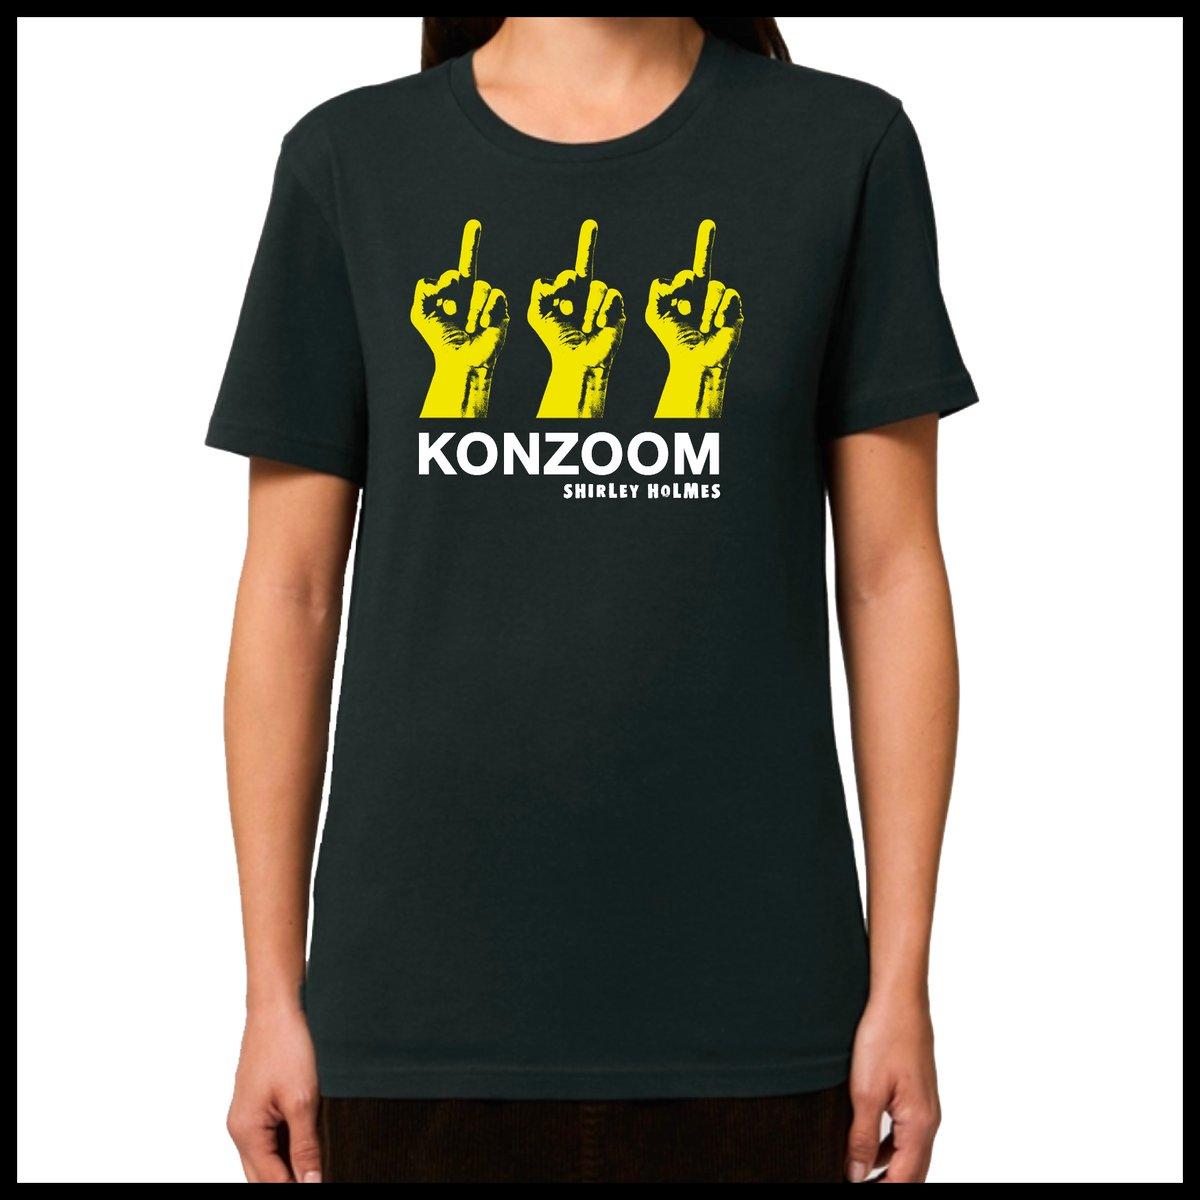 KONZOOM  Shirt  **UNISEX**  Black/Yellow